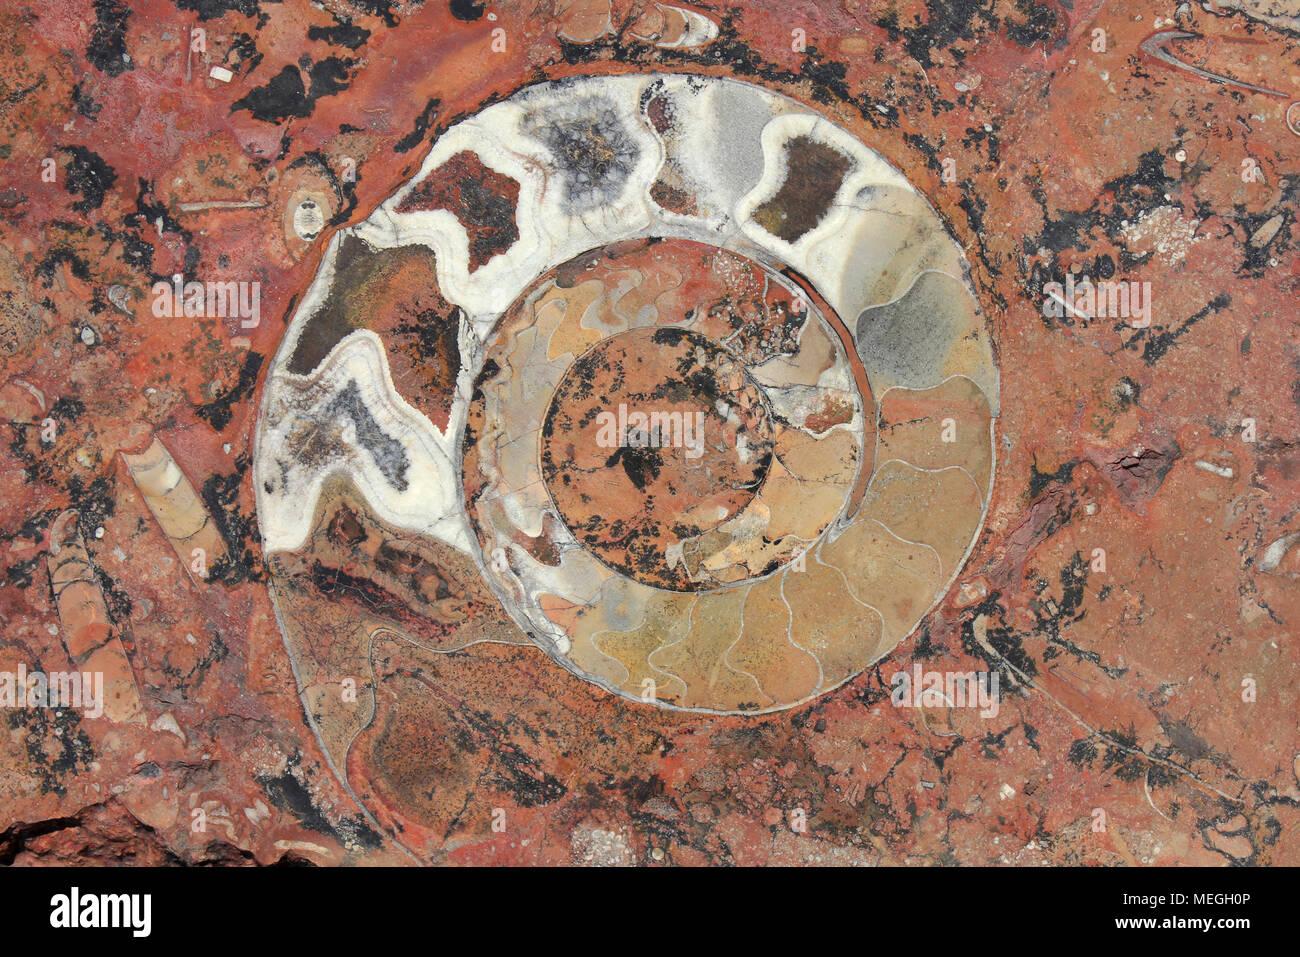 Ammonite (Goniatite) Fossil, Morocco - Stock Image